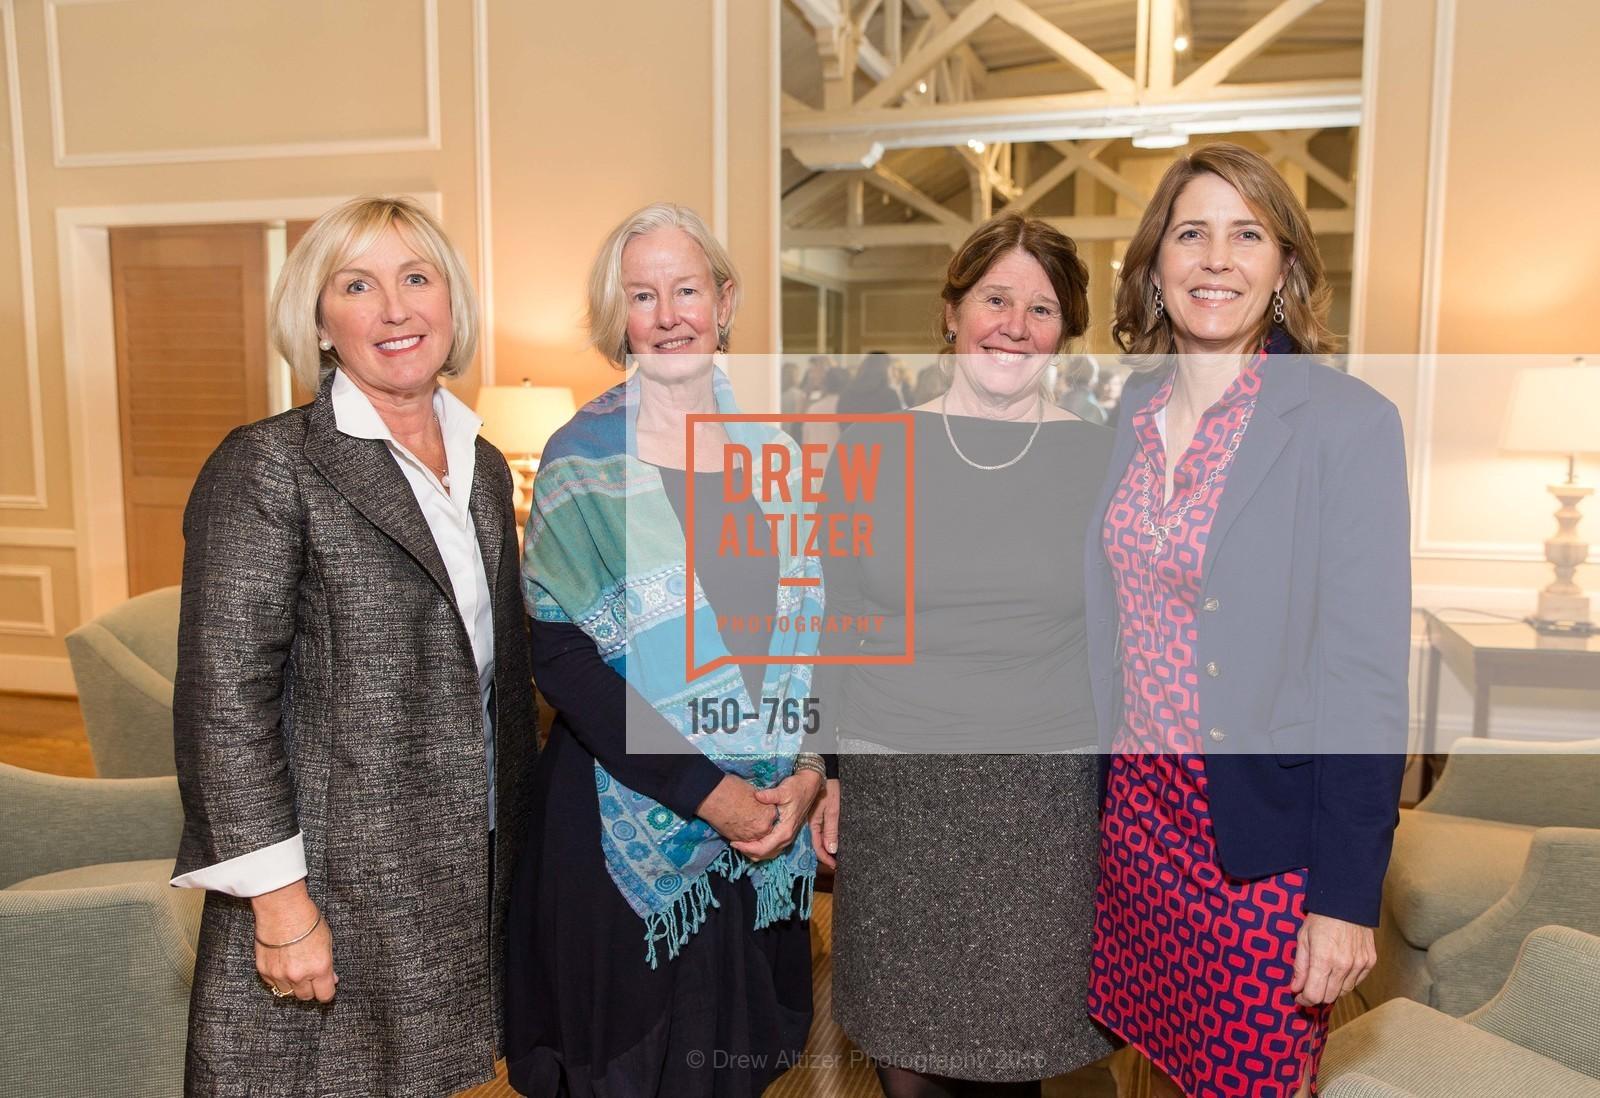 Dana Teixeira, Lucy Ballard, Gayle Snyder, Libby Hulsey, Photo #150-765